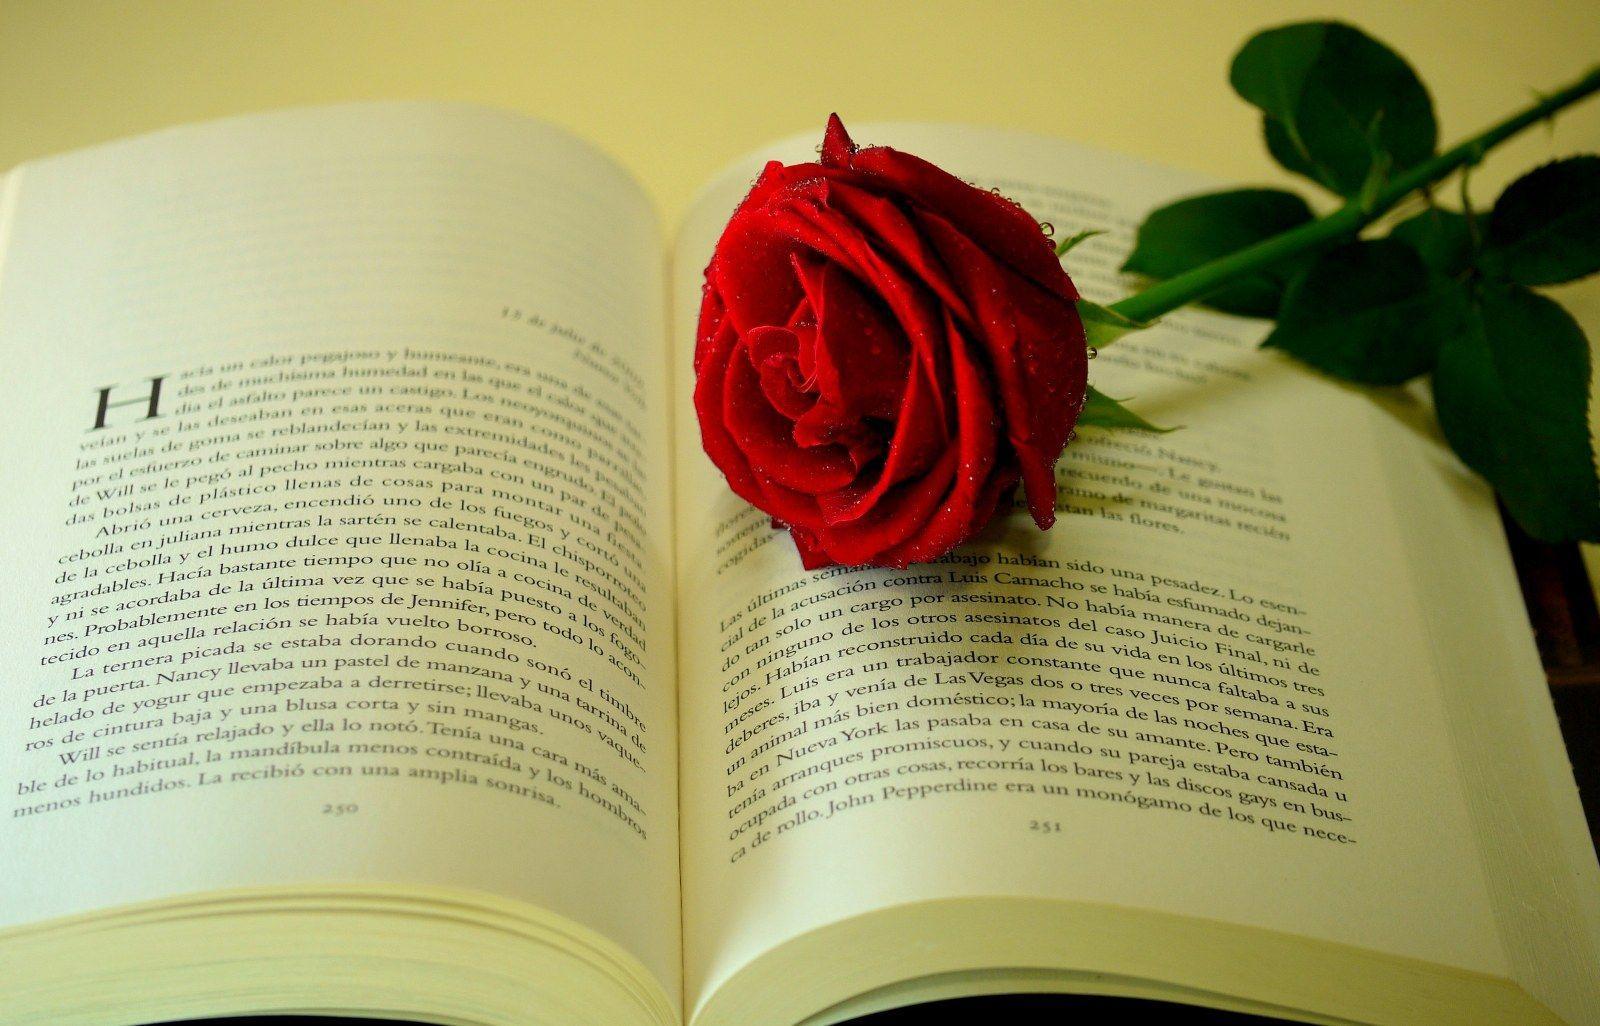 flower flowers rose lover wallpapers desktop books lovers relationship literature pantser amor amo lectura leer por romance romancing words wallpapercave